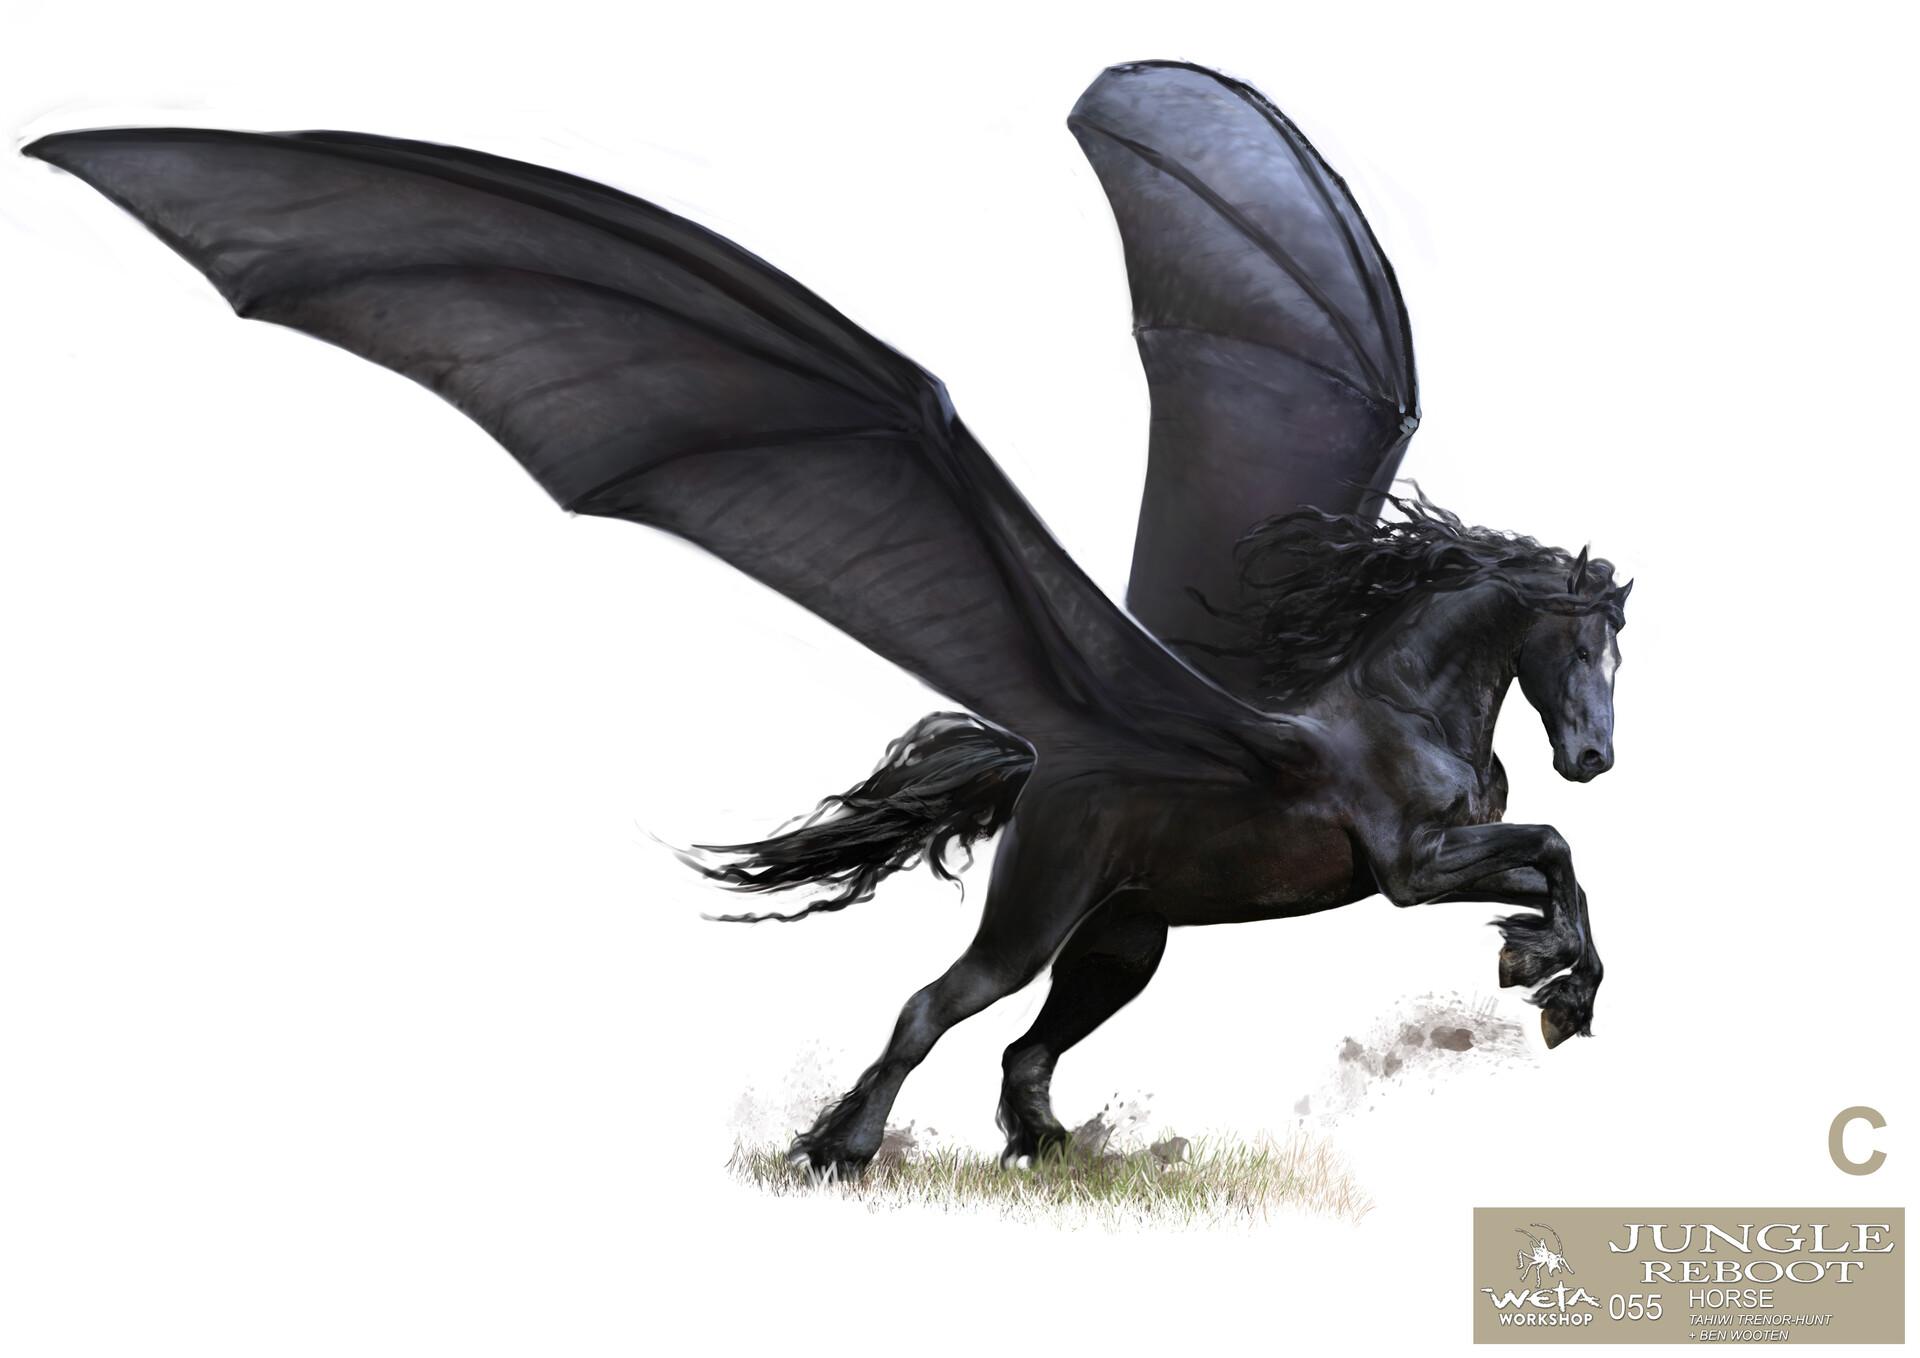 Weta workshop design studio 055 jr horse open wings 04 tth